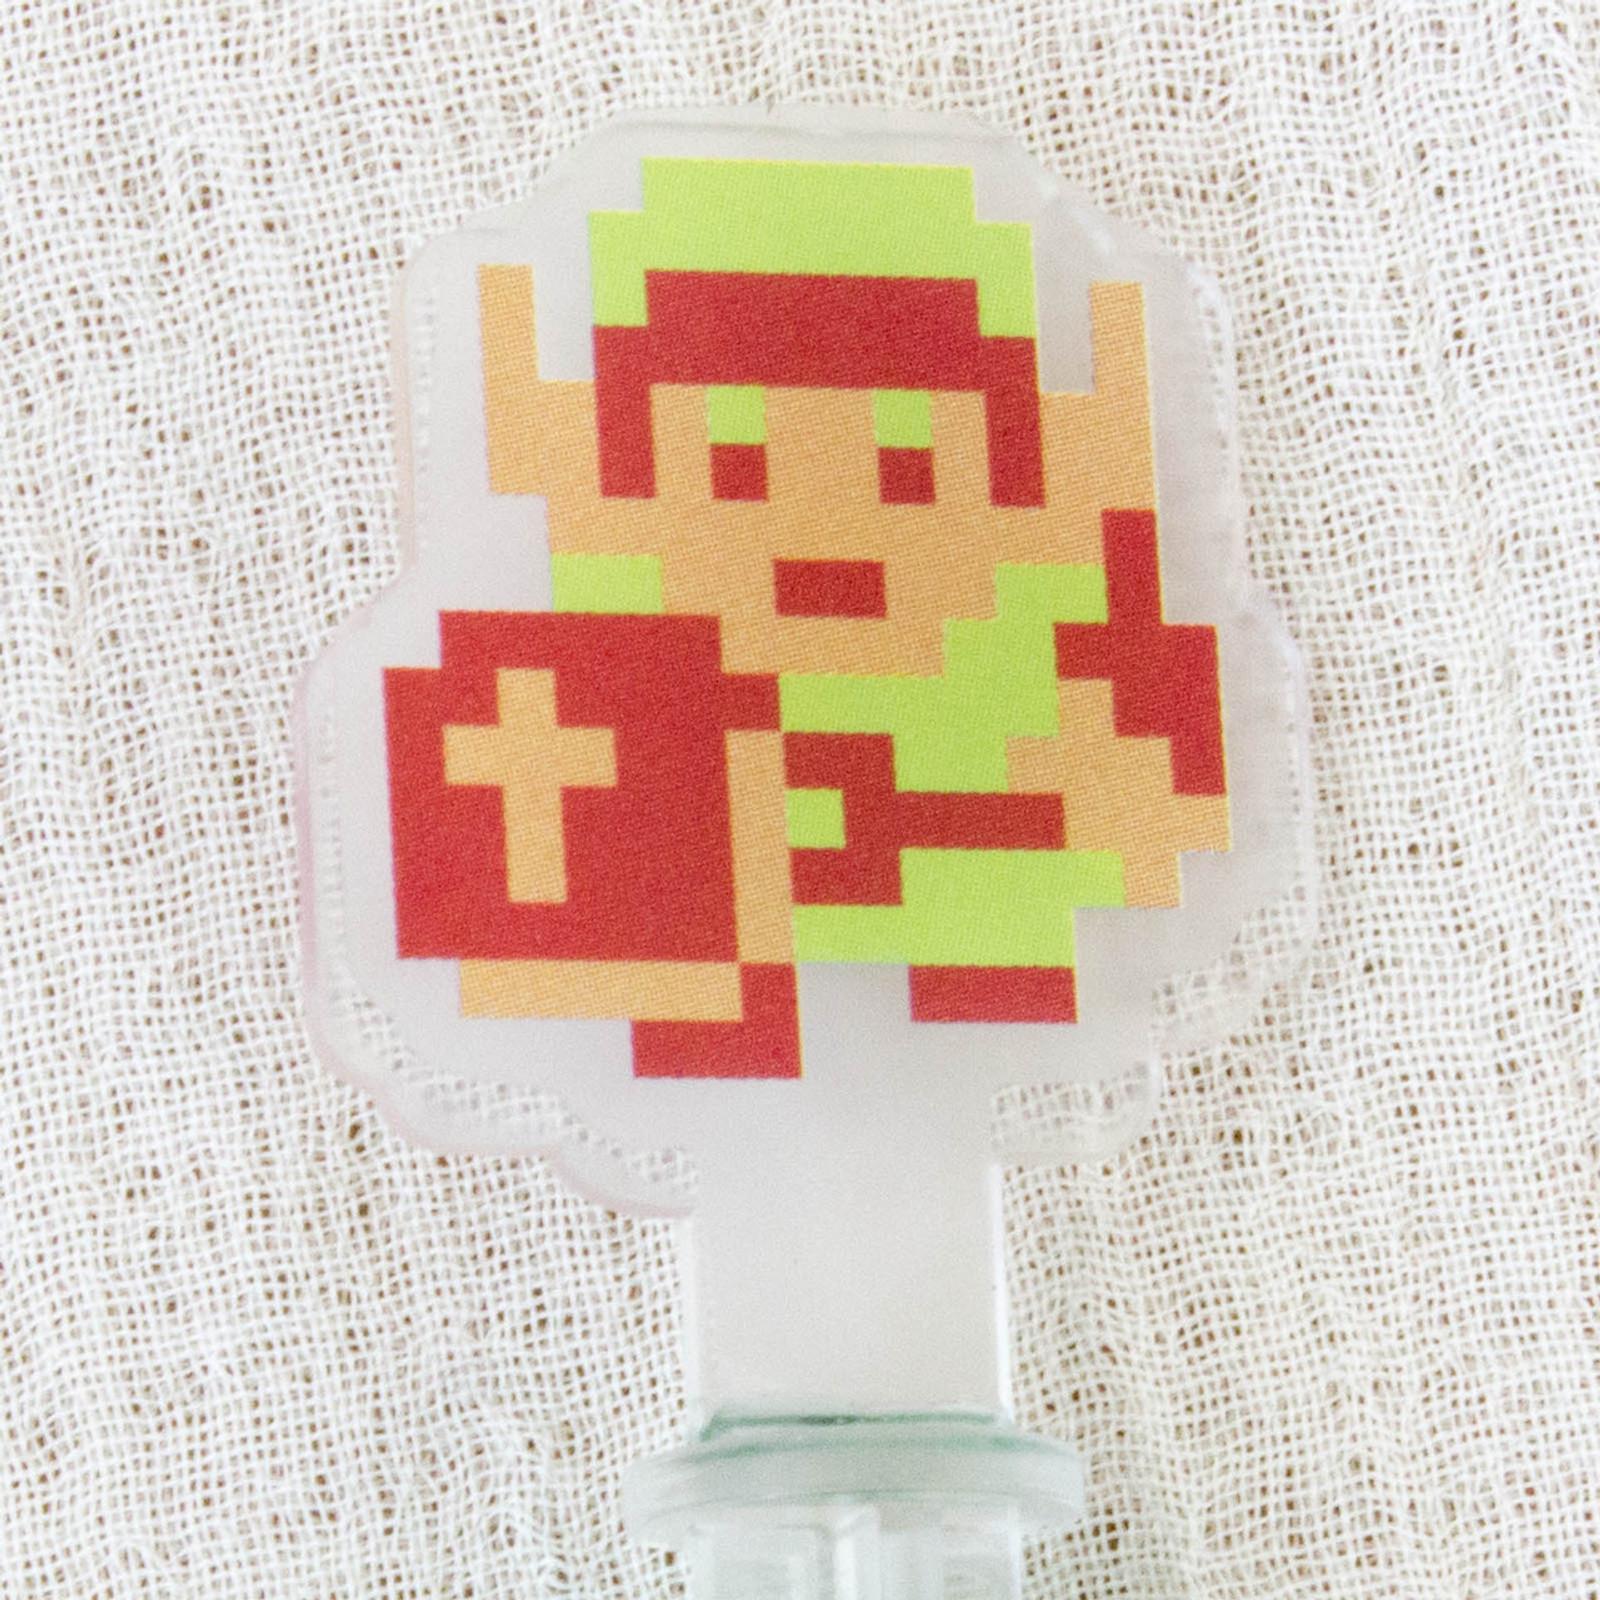 Legend of Zelda Historical 3DS Chara Touch Pen JAPAN FAMICOM NES NINTENDO 1